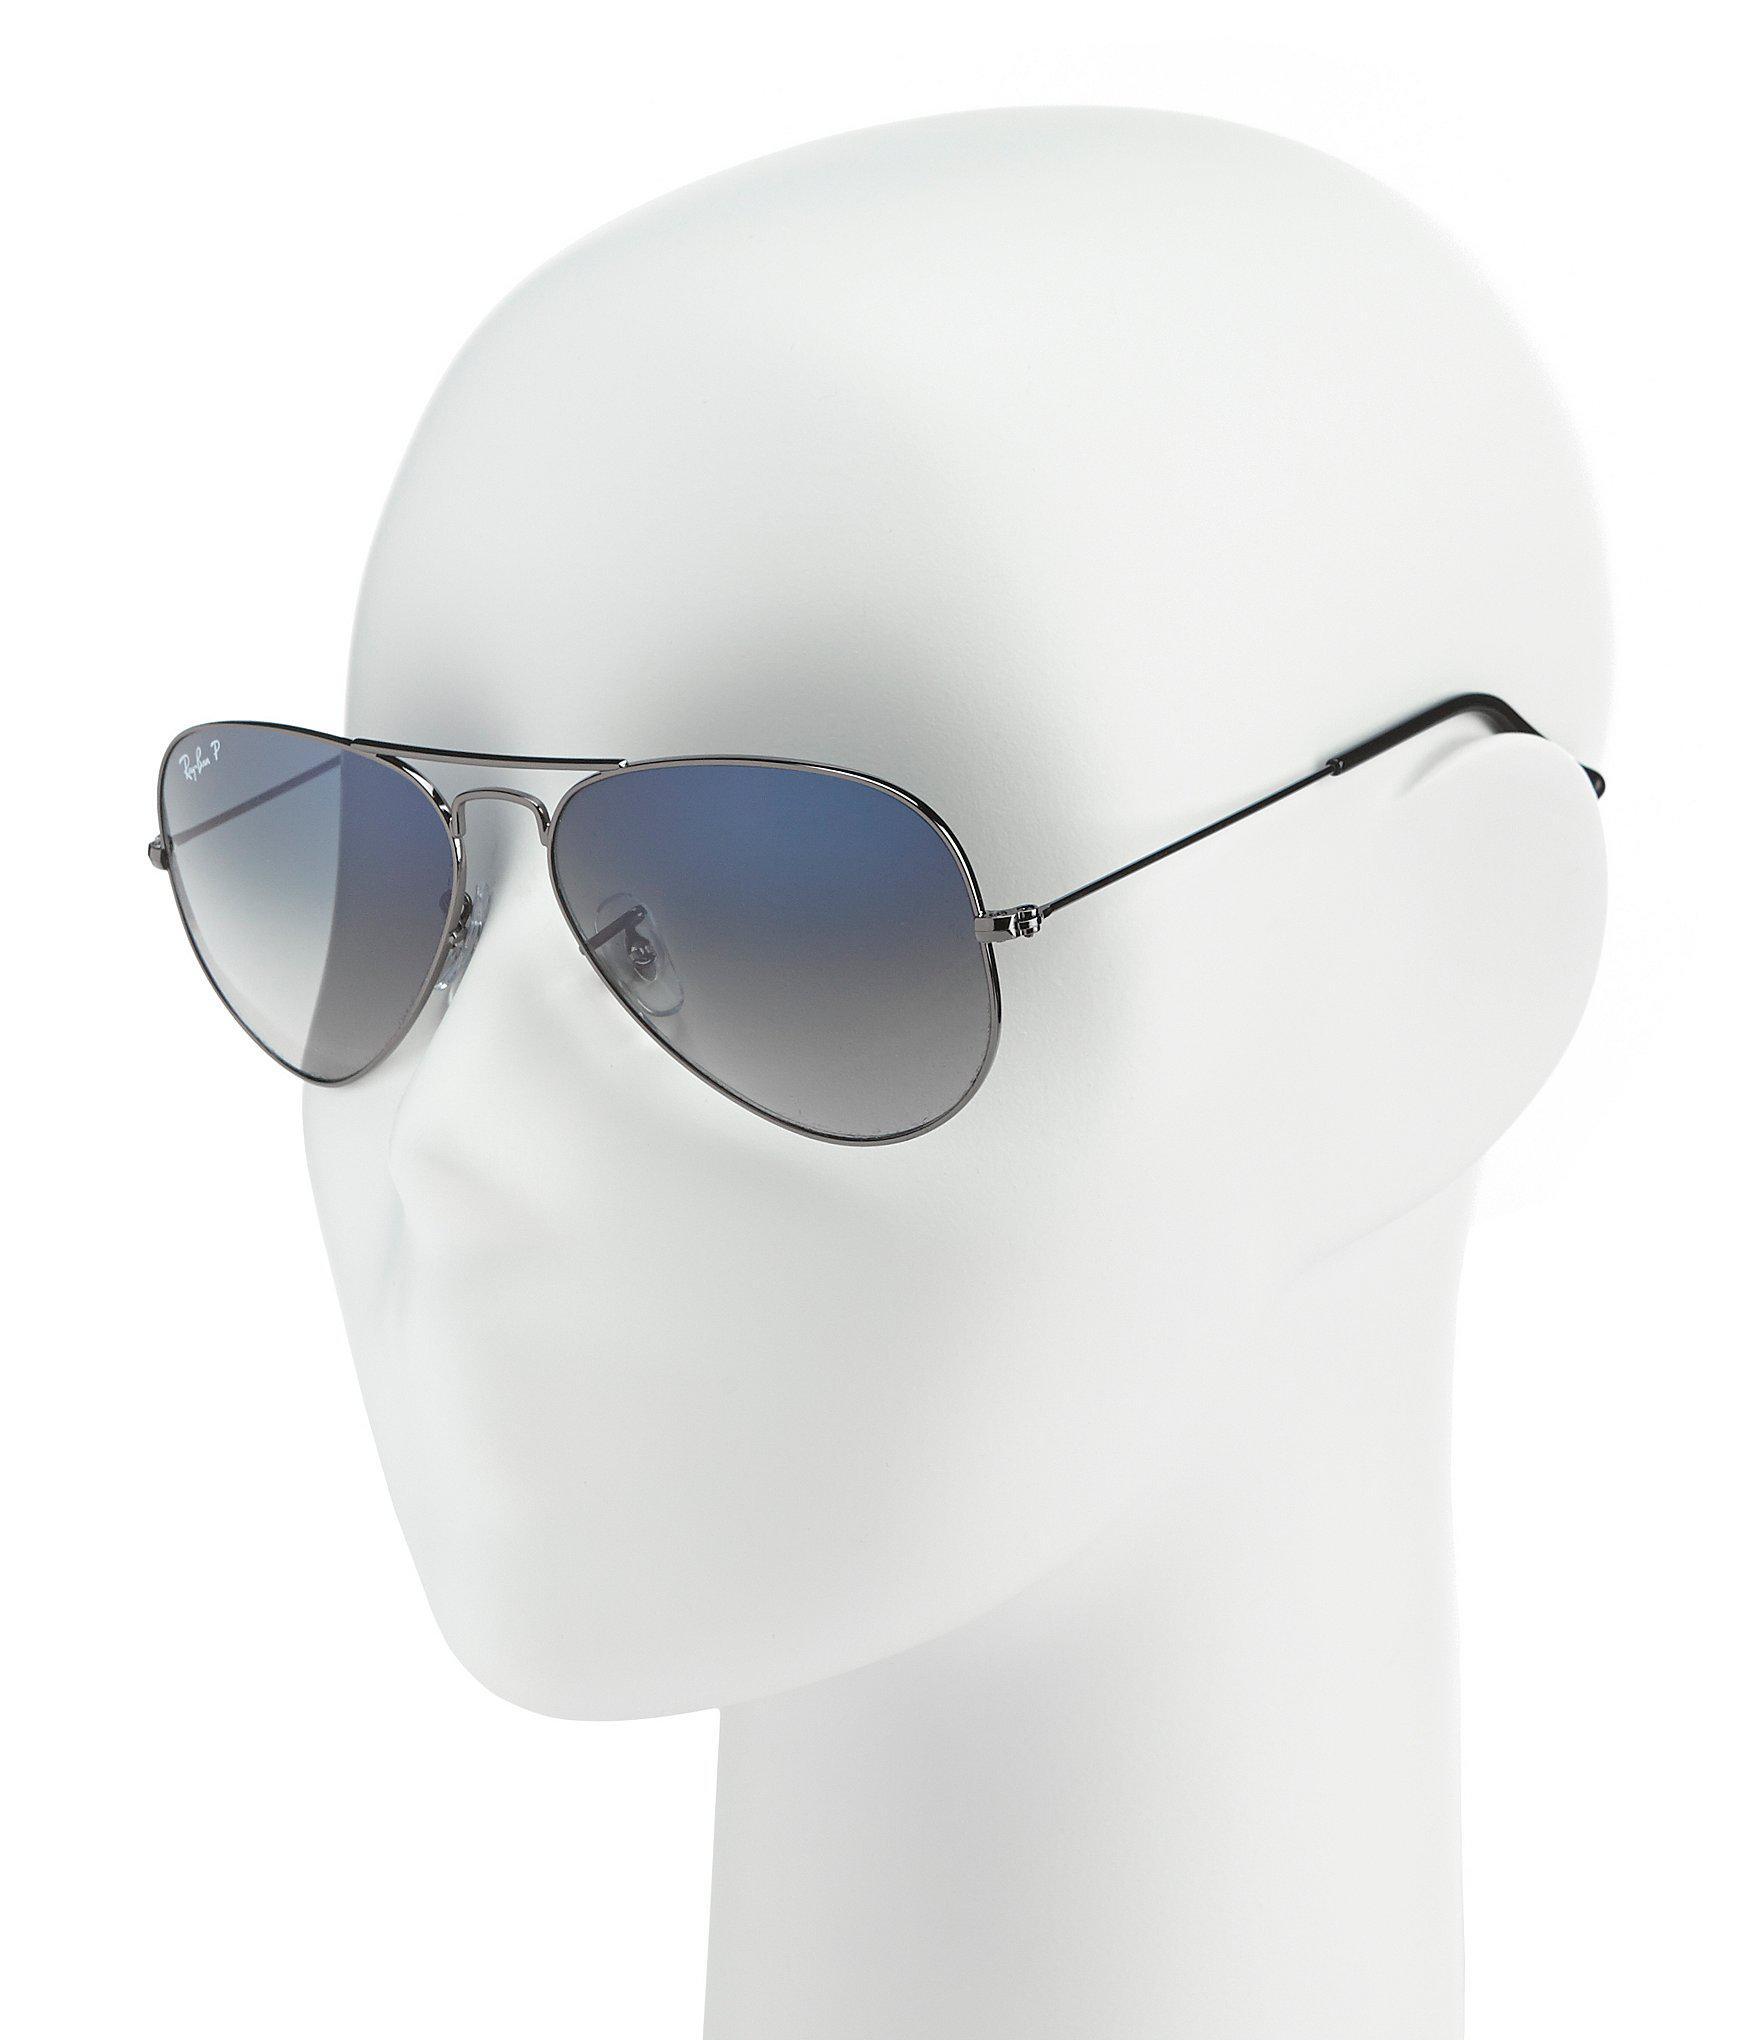 b219e215f51 Ray-Ban - Blue Polarized Metal Uv Protection Aviator Sunglasses for Men -  Lyst. View fullscreen